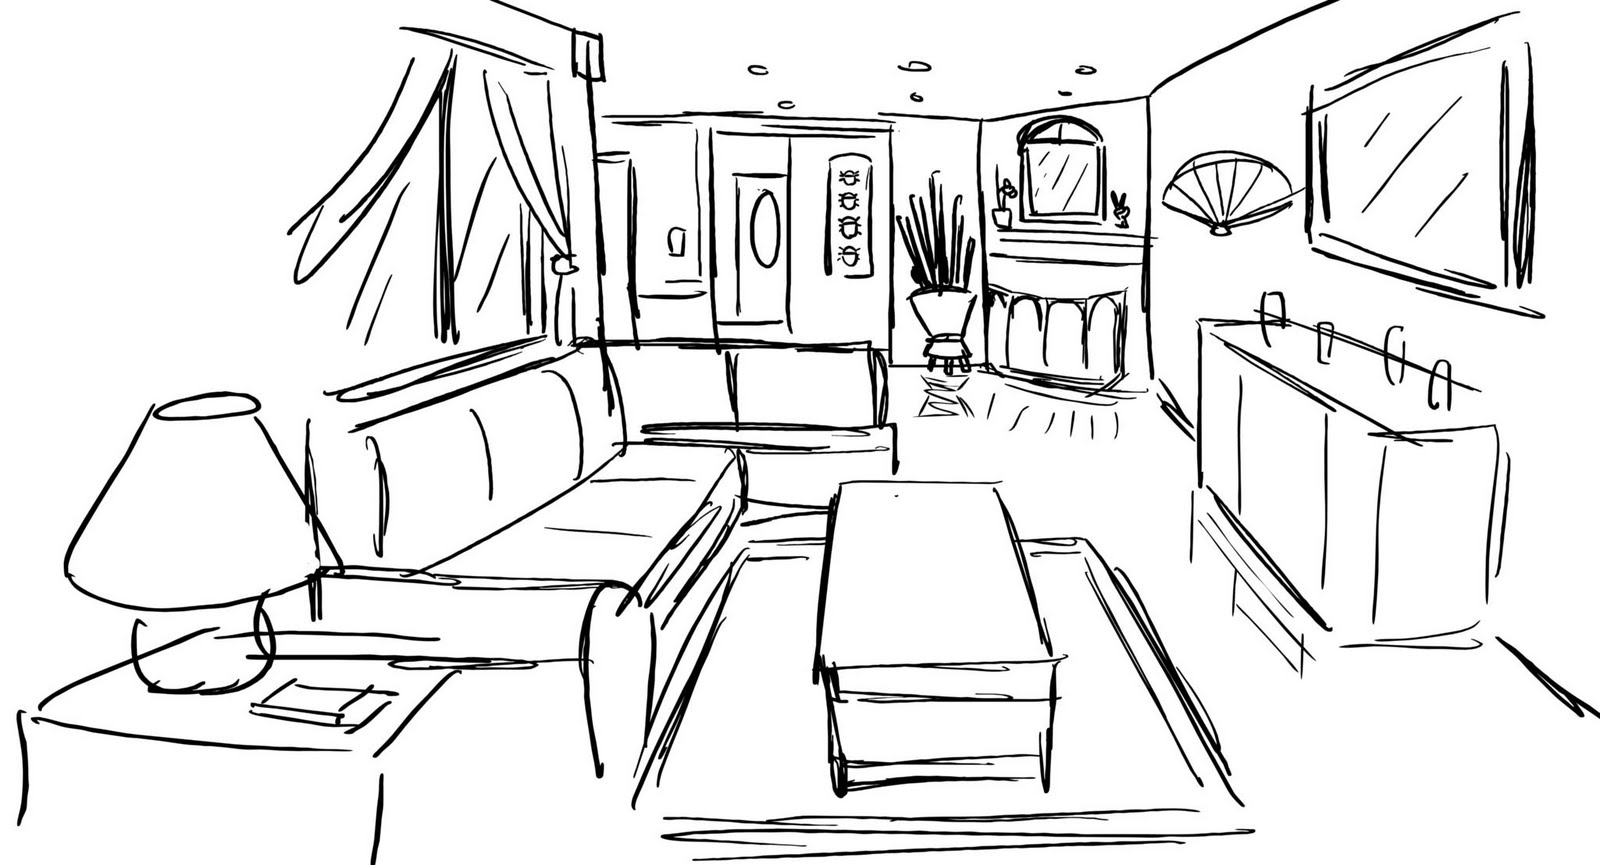 Drawn hosue inside Interior Easy  In Design